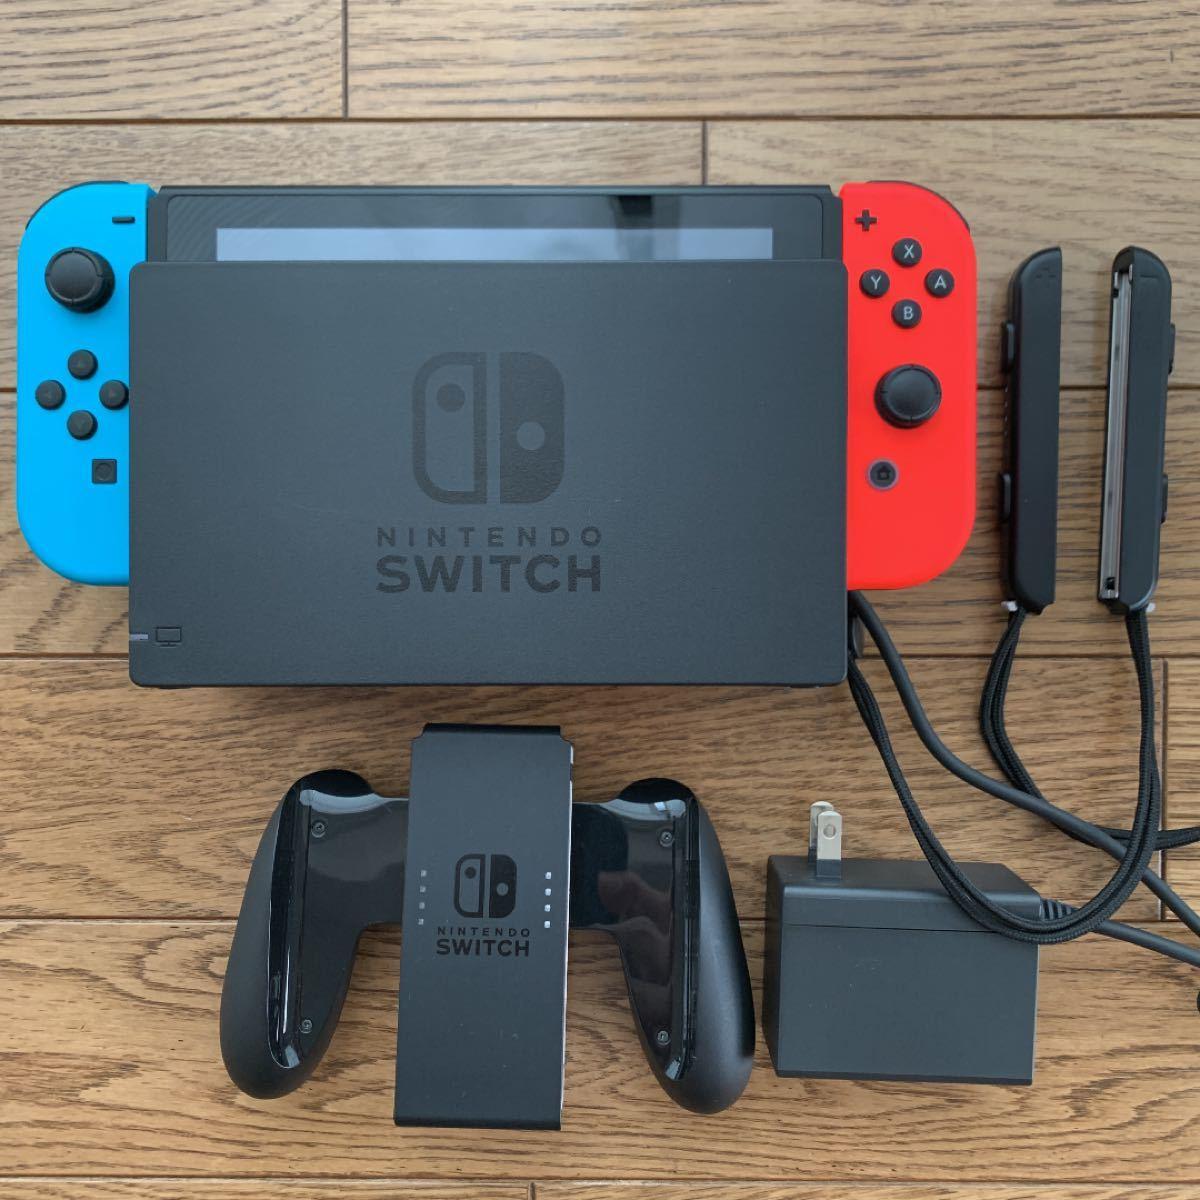 Nintendo Switch ニンテンドースイッチ【箱あり、メーカー保証あり】 ネオンレッド ネオンブルー 新モデル 即購入OK